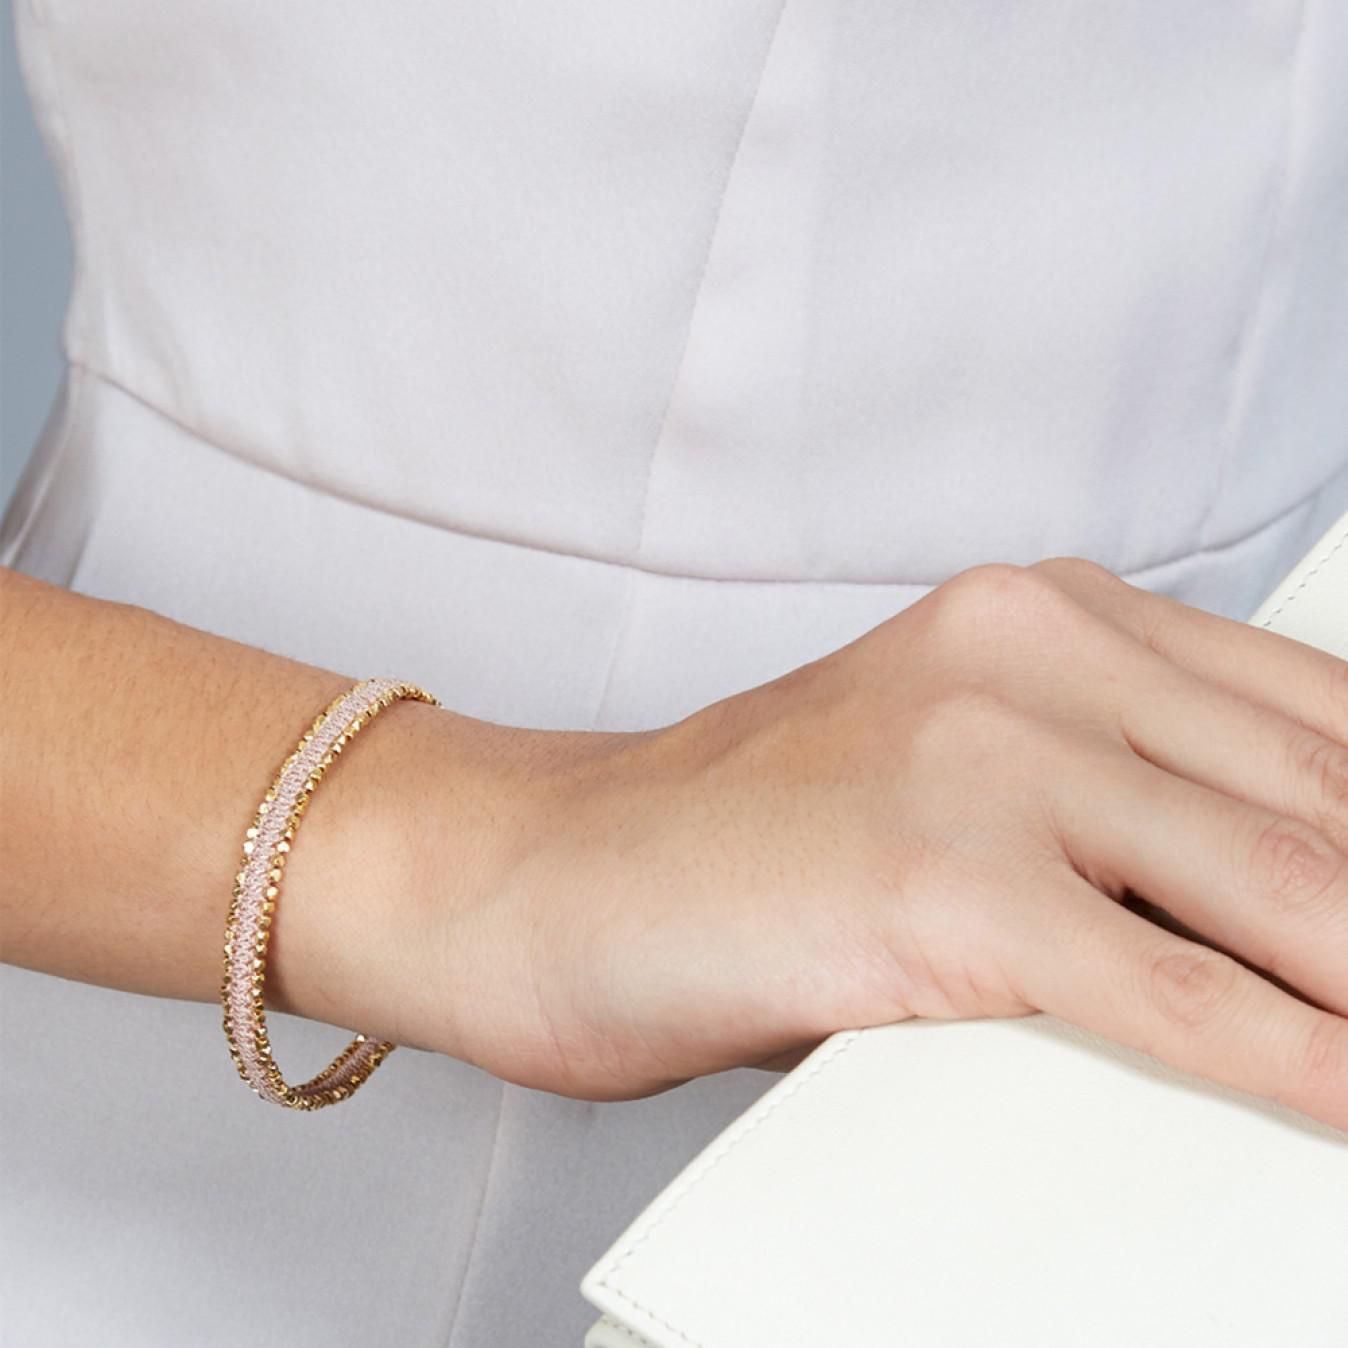 d353b929c90 Astley Clarke Peach Blush Nugget Biography Bracelet in Metallic - Lyst